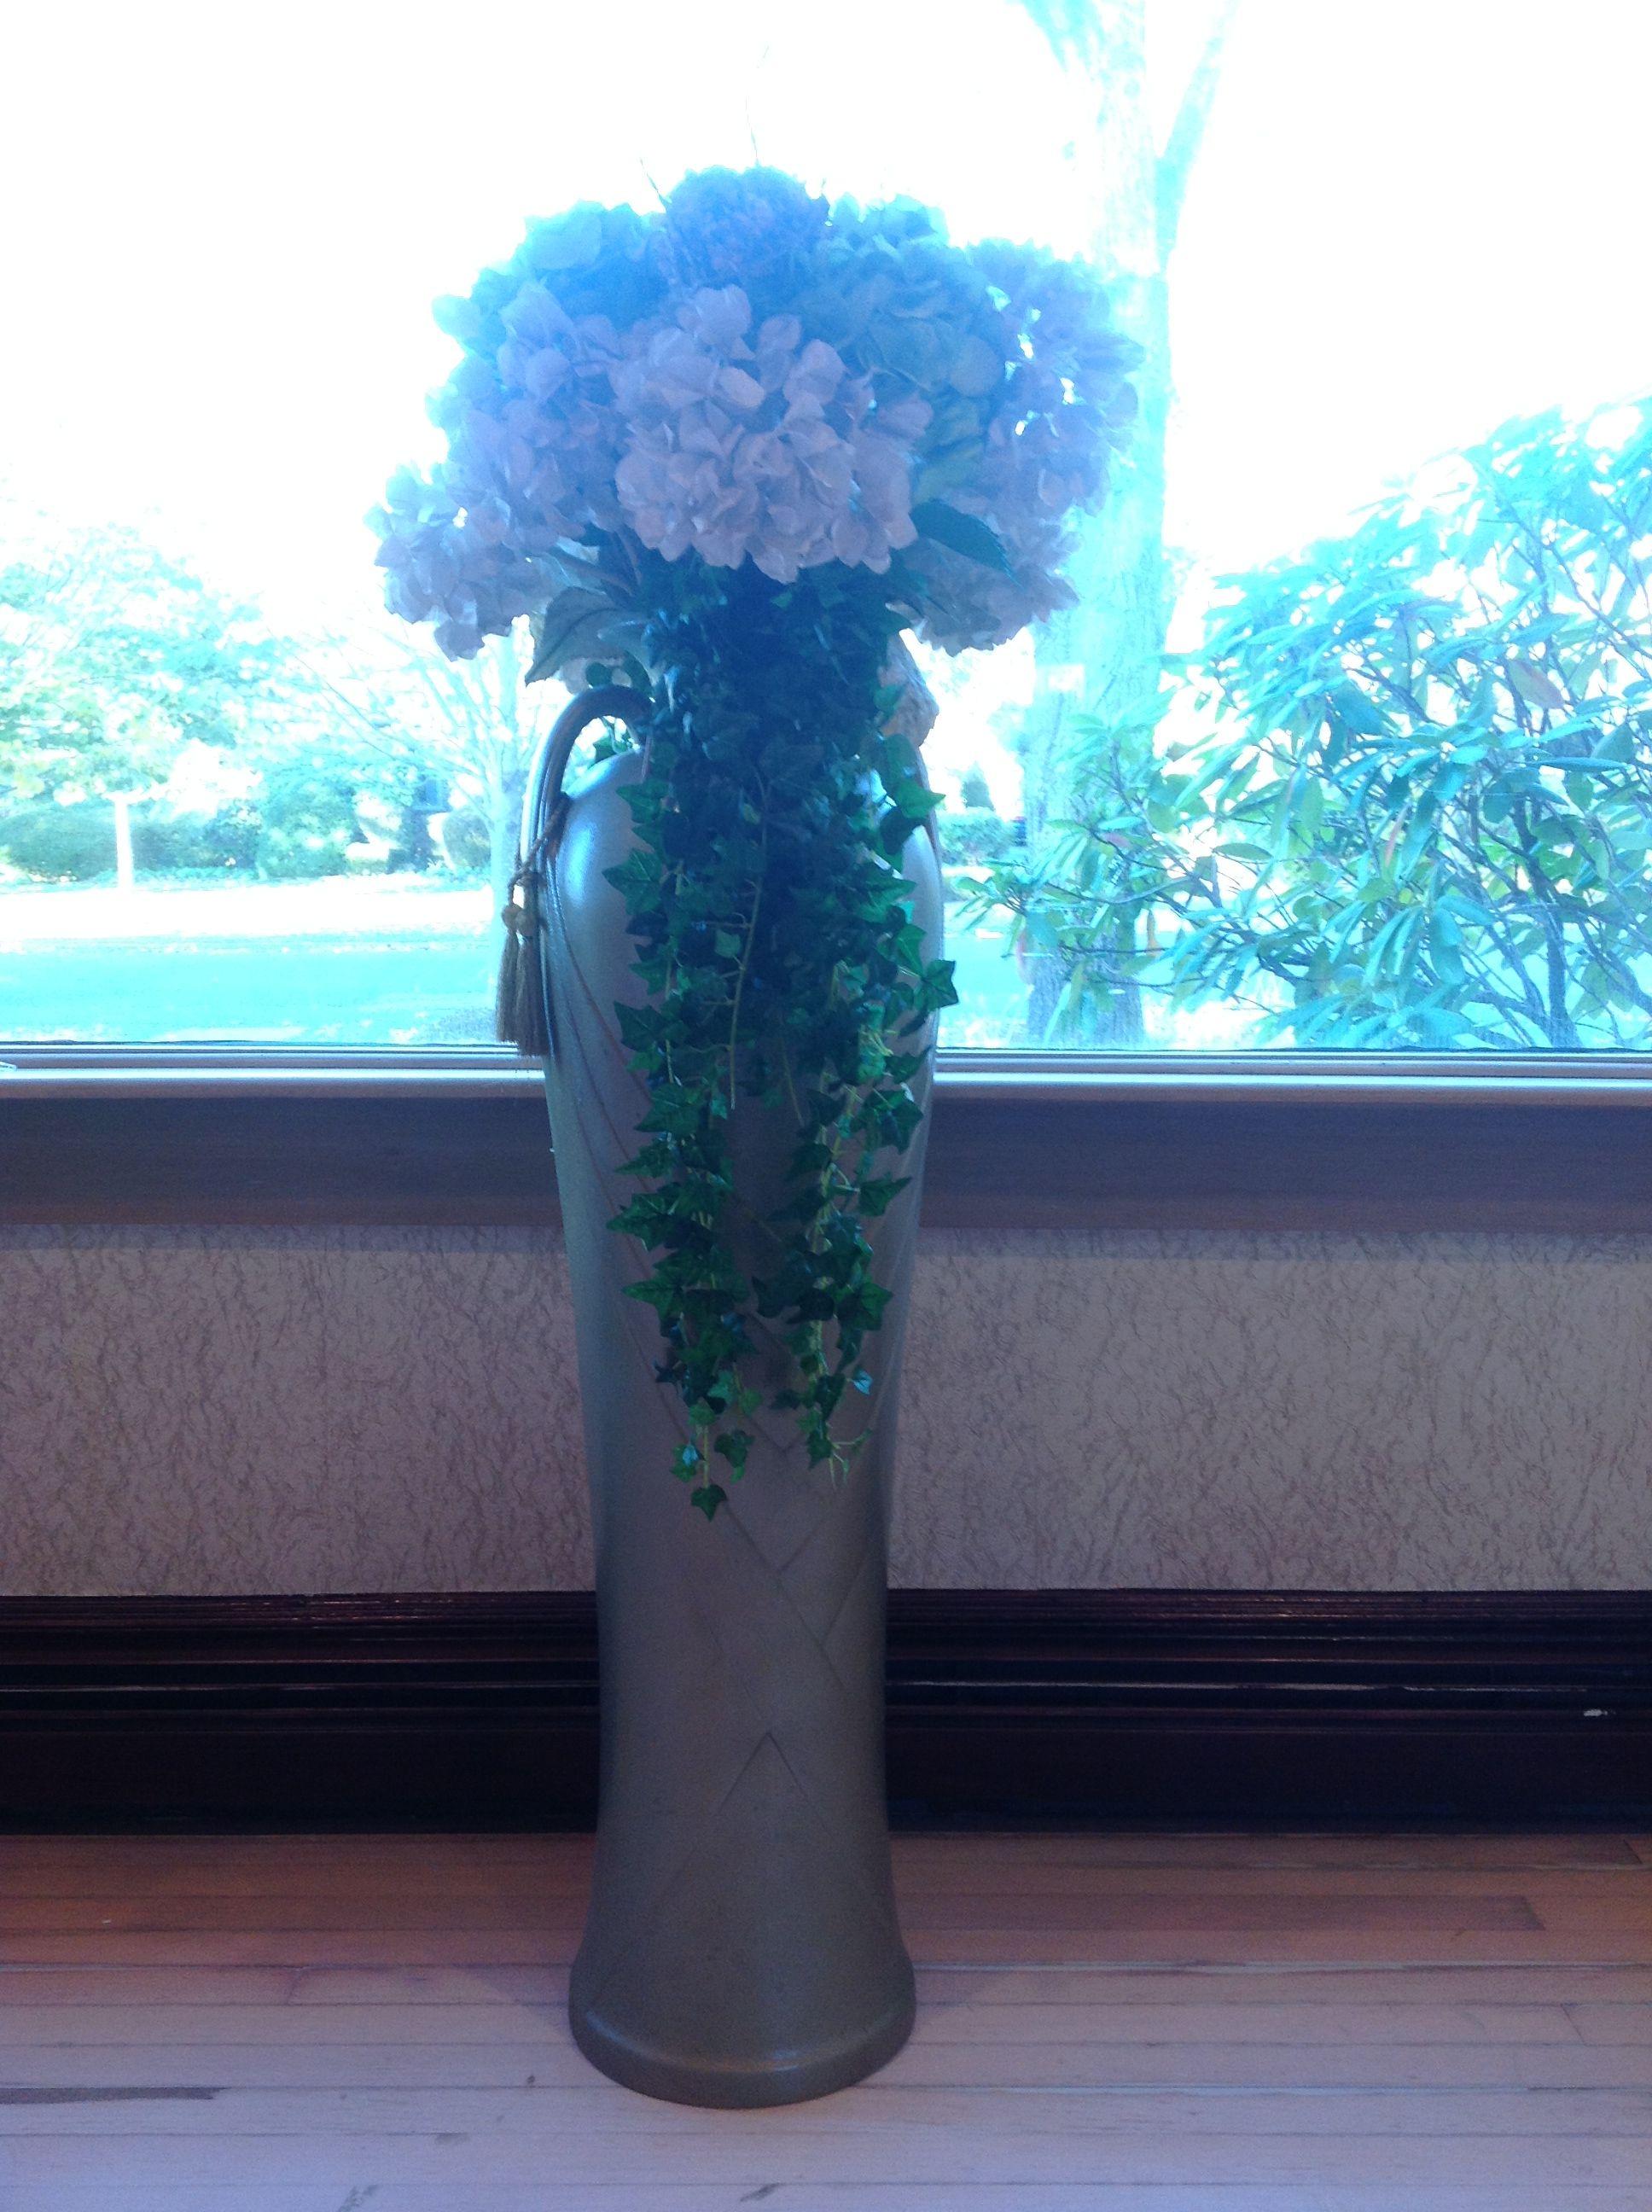 My floor vase filled with dried cream hydrangea flowers | My Living on fruit vase, colored pencil vase, hyacinth vase, warrior vase, hydro vase, orange poppy vase, hibiscus vase, gardenia vase, lily vase, peony vase, rubin's vase, geometric vase, the blue vase, iron wall vase, lilies of the valley vase, succulent vase, bonsai vase, wedding bouquet vase, curly willow vase, wisteria vase,